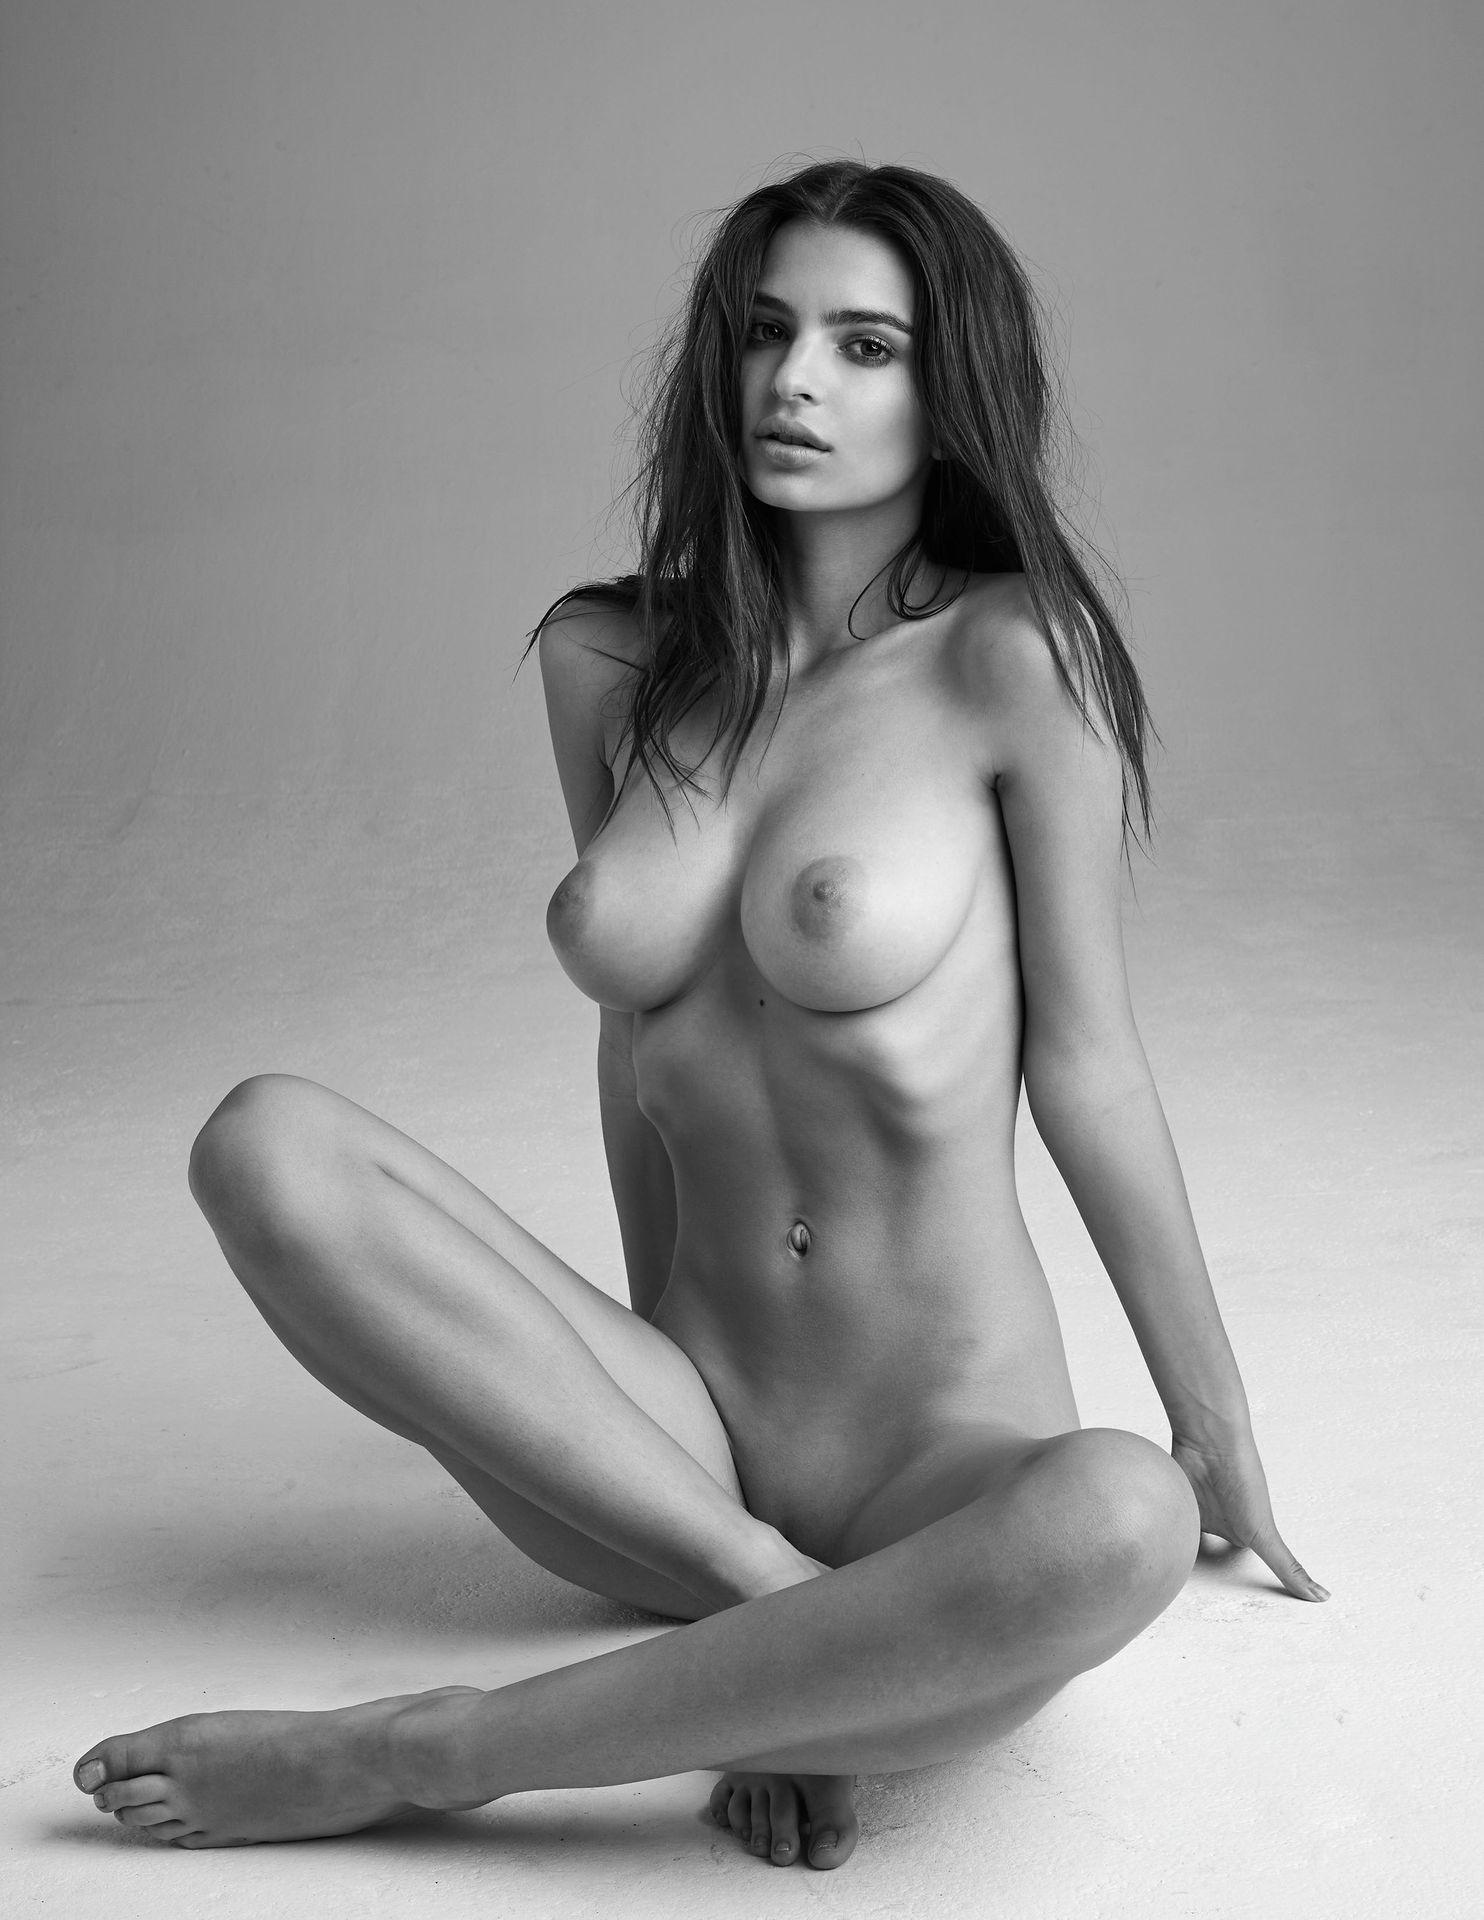 Emily-Ratajkowski-Nude-17-thefappeningblog.com_.jpg